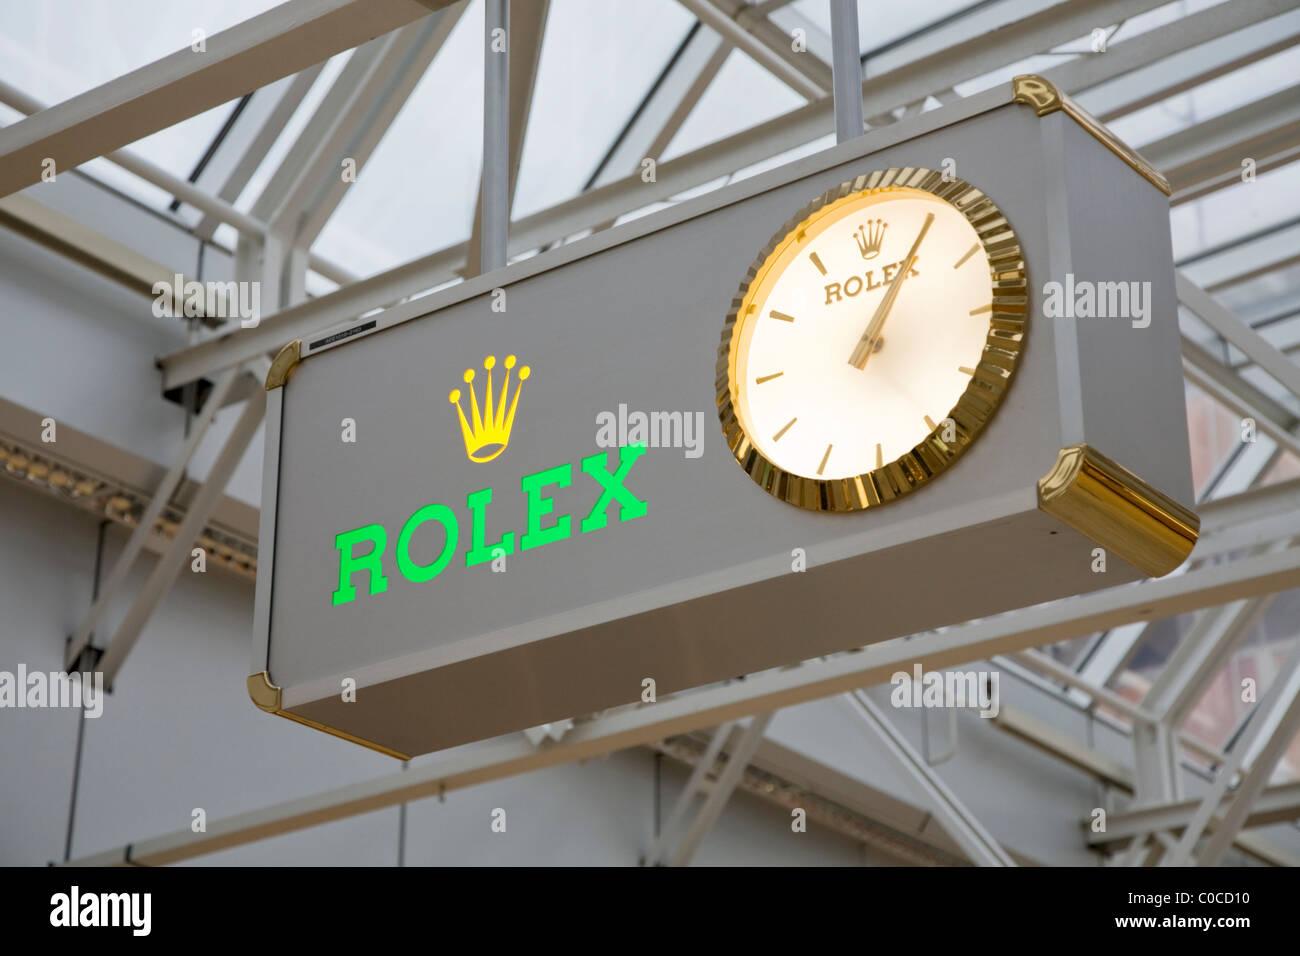 Display clock advertising Rolex brand of watches. International terminal departure hall, Geneva / Geneve Airport, Stock Photo